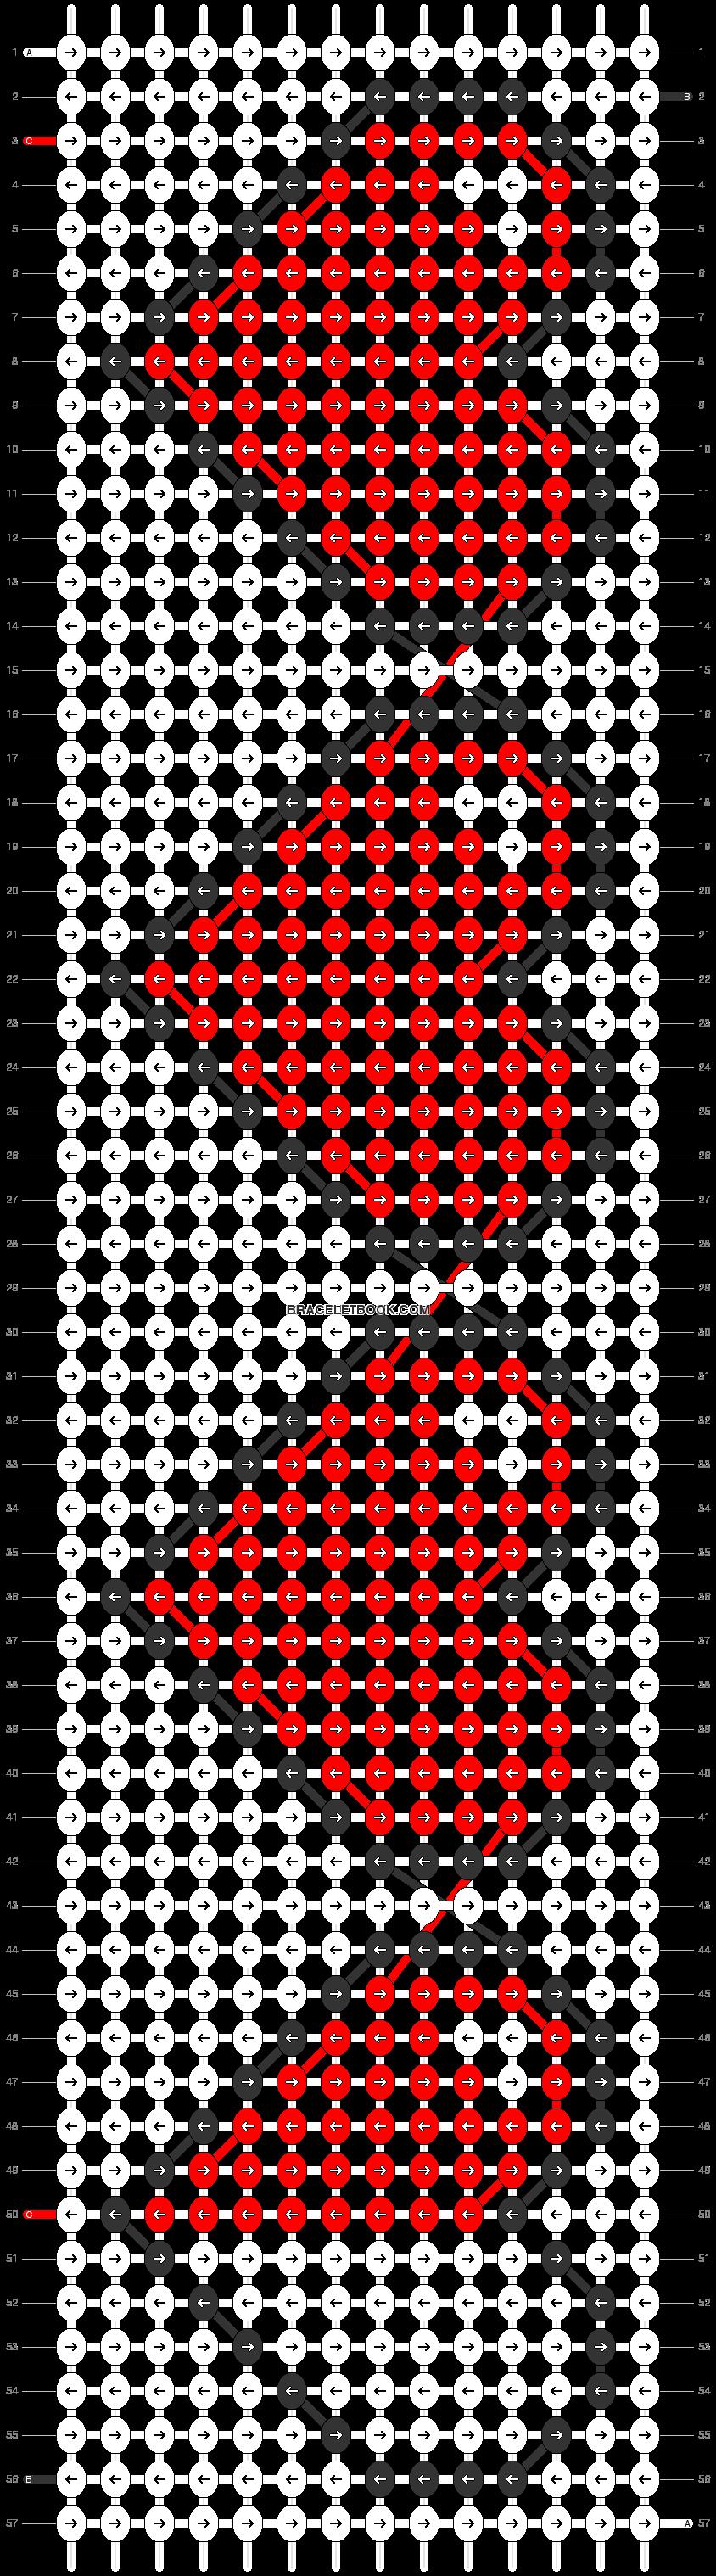 Game Lives Friendship Bracelet Pattern Number #4495  For More Patterns And  Tutorials Visit Our